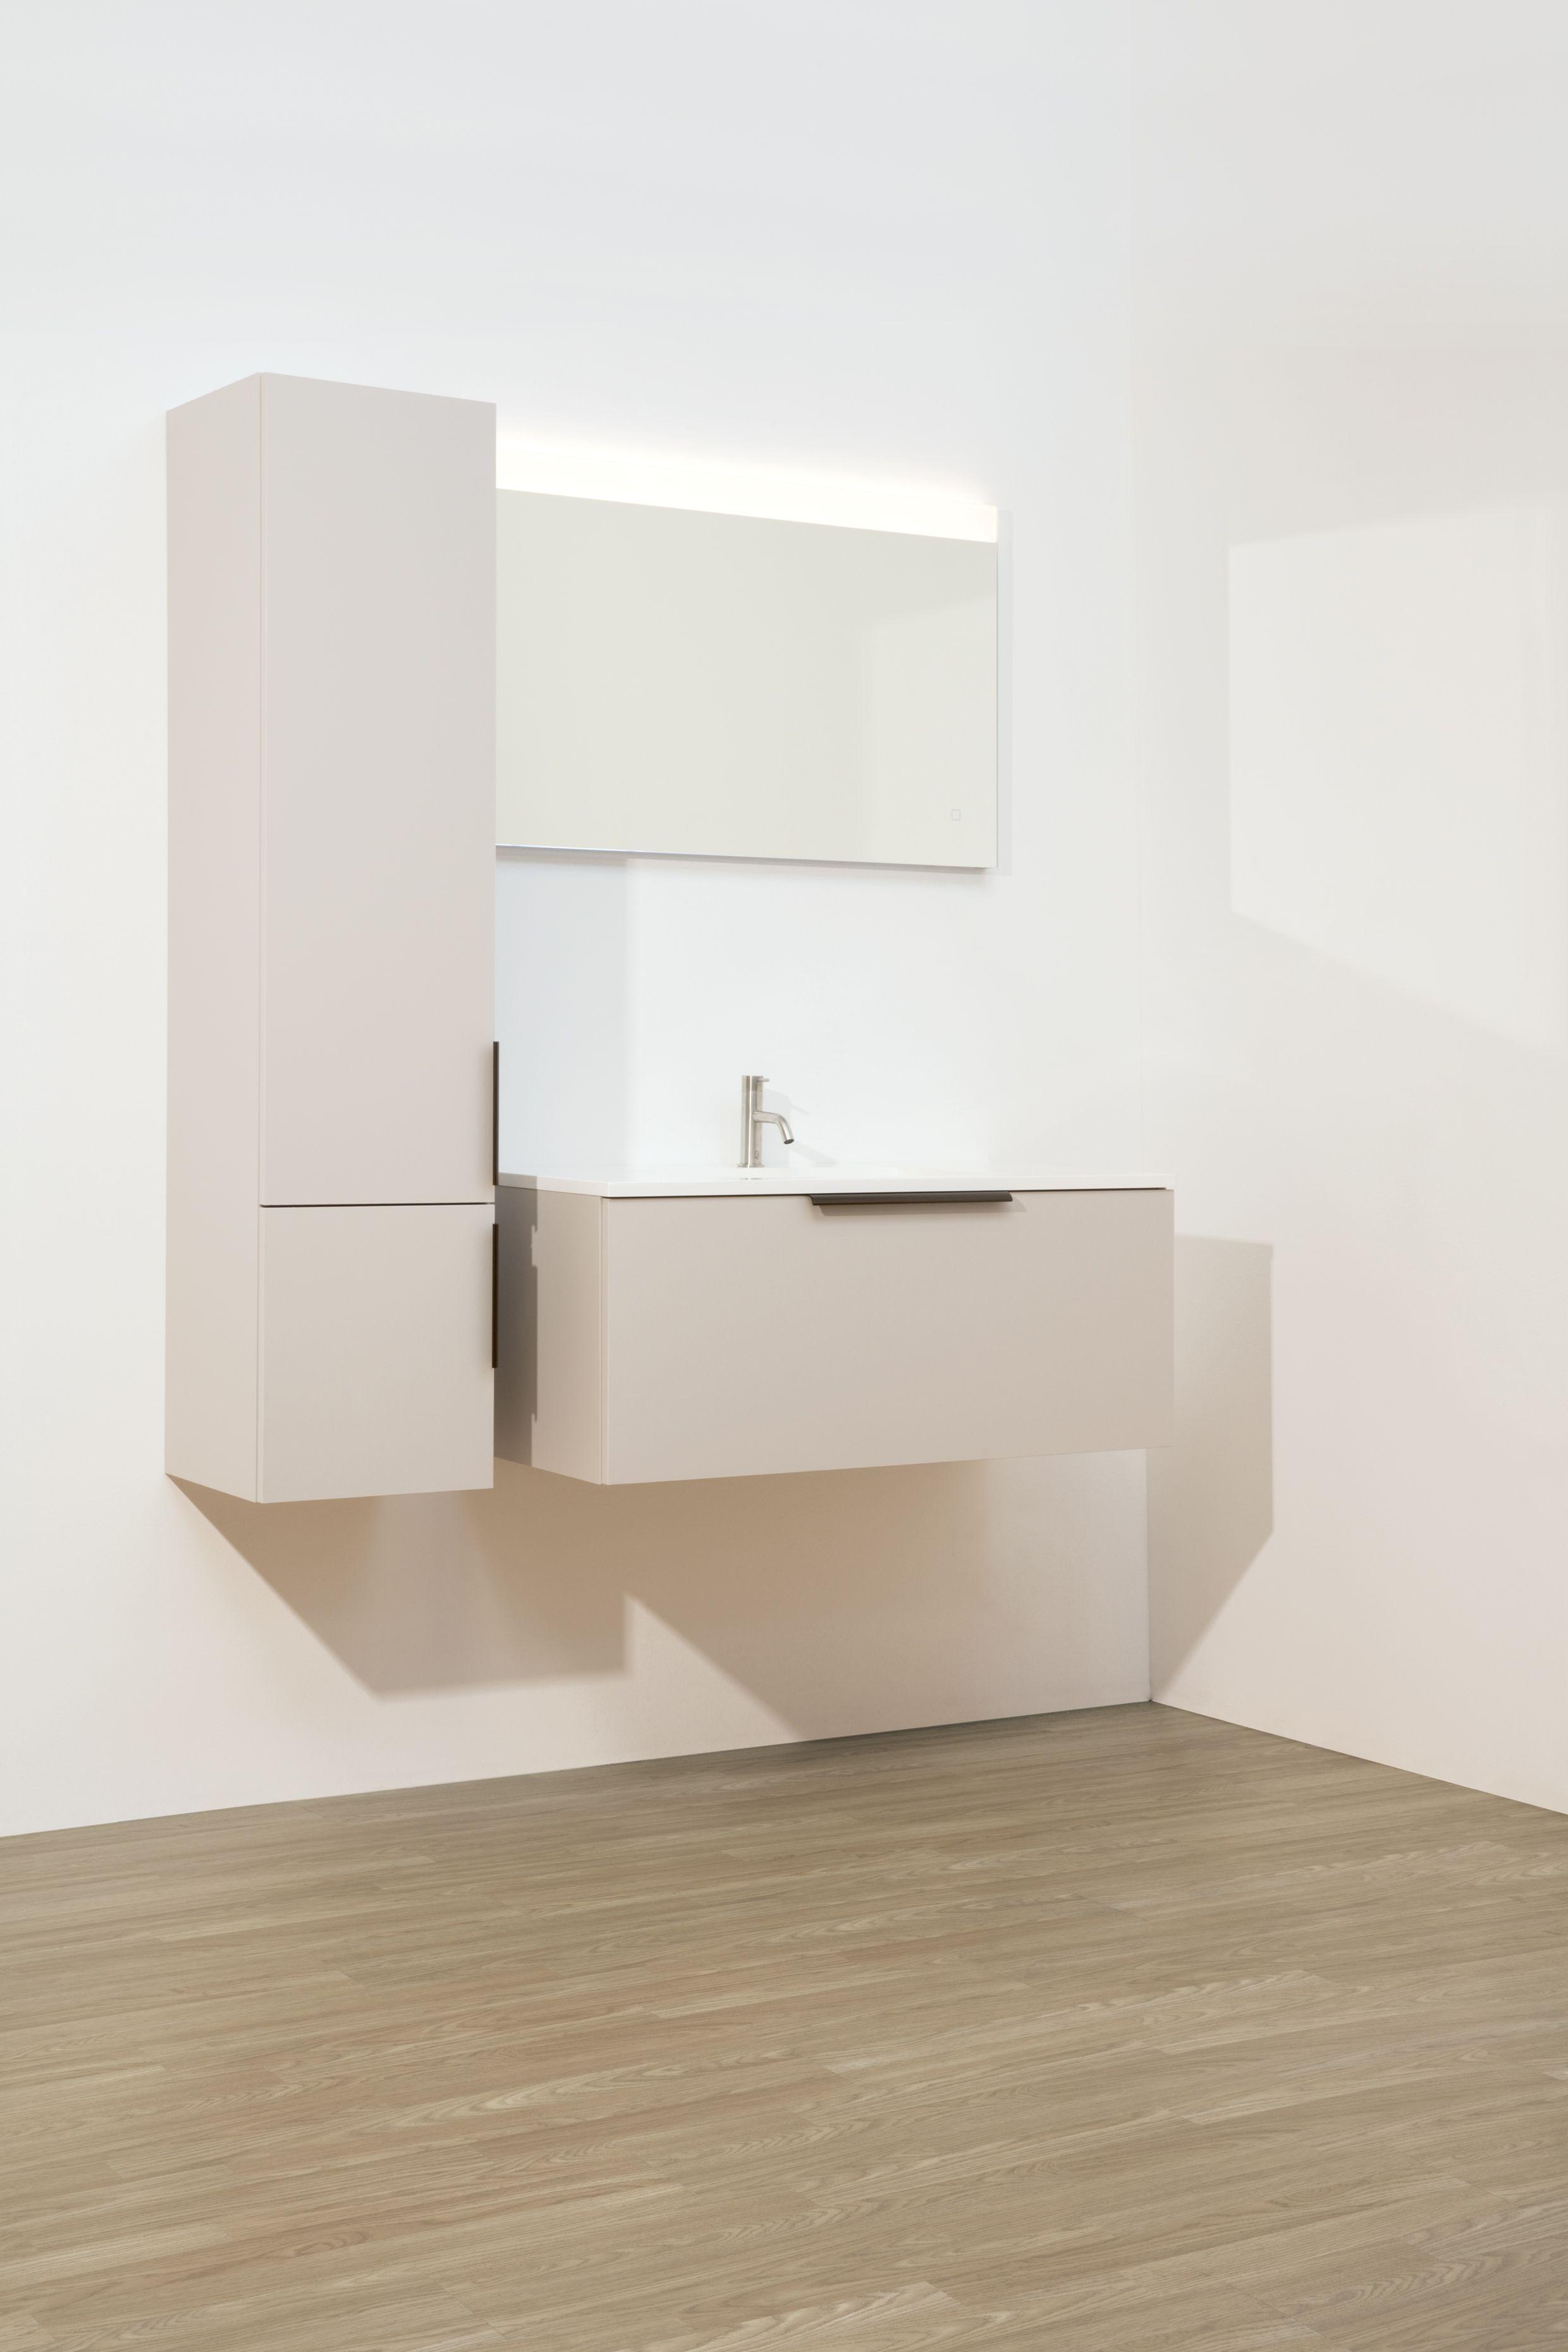 Van Marcke Badkamermeubel Novo Uno In 2020 Badkamermeubel Meubels Interieur